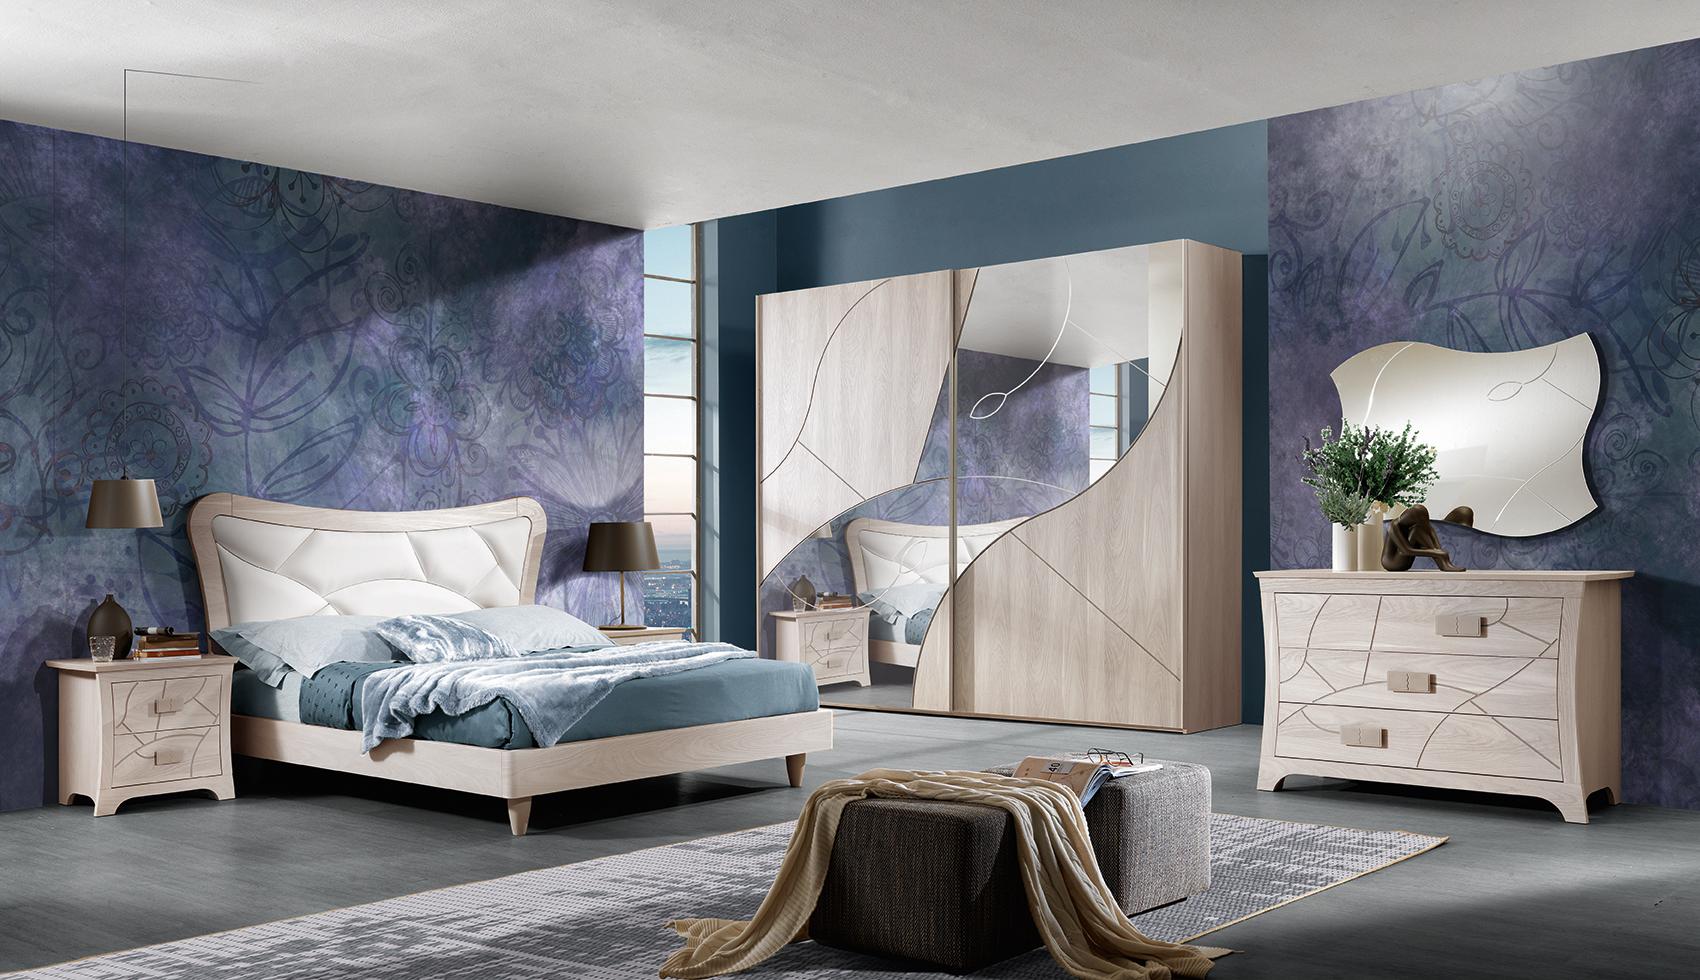 غرف نوم مودرن 2020 كامله تصميمات غرف نوم لعام 2020 احبك موت